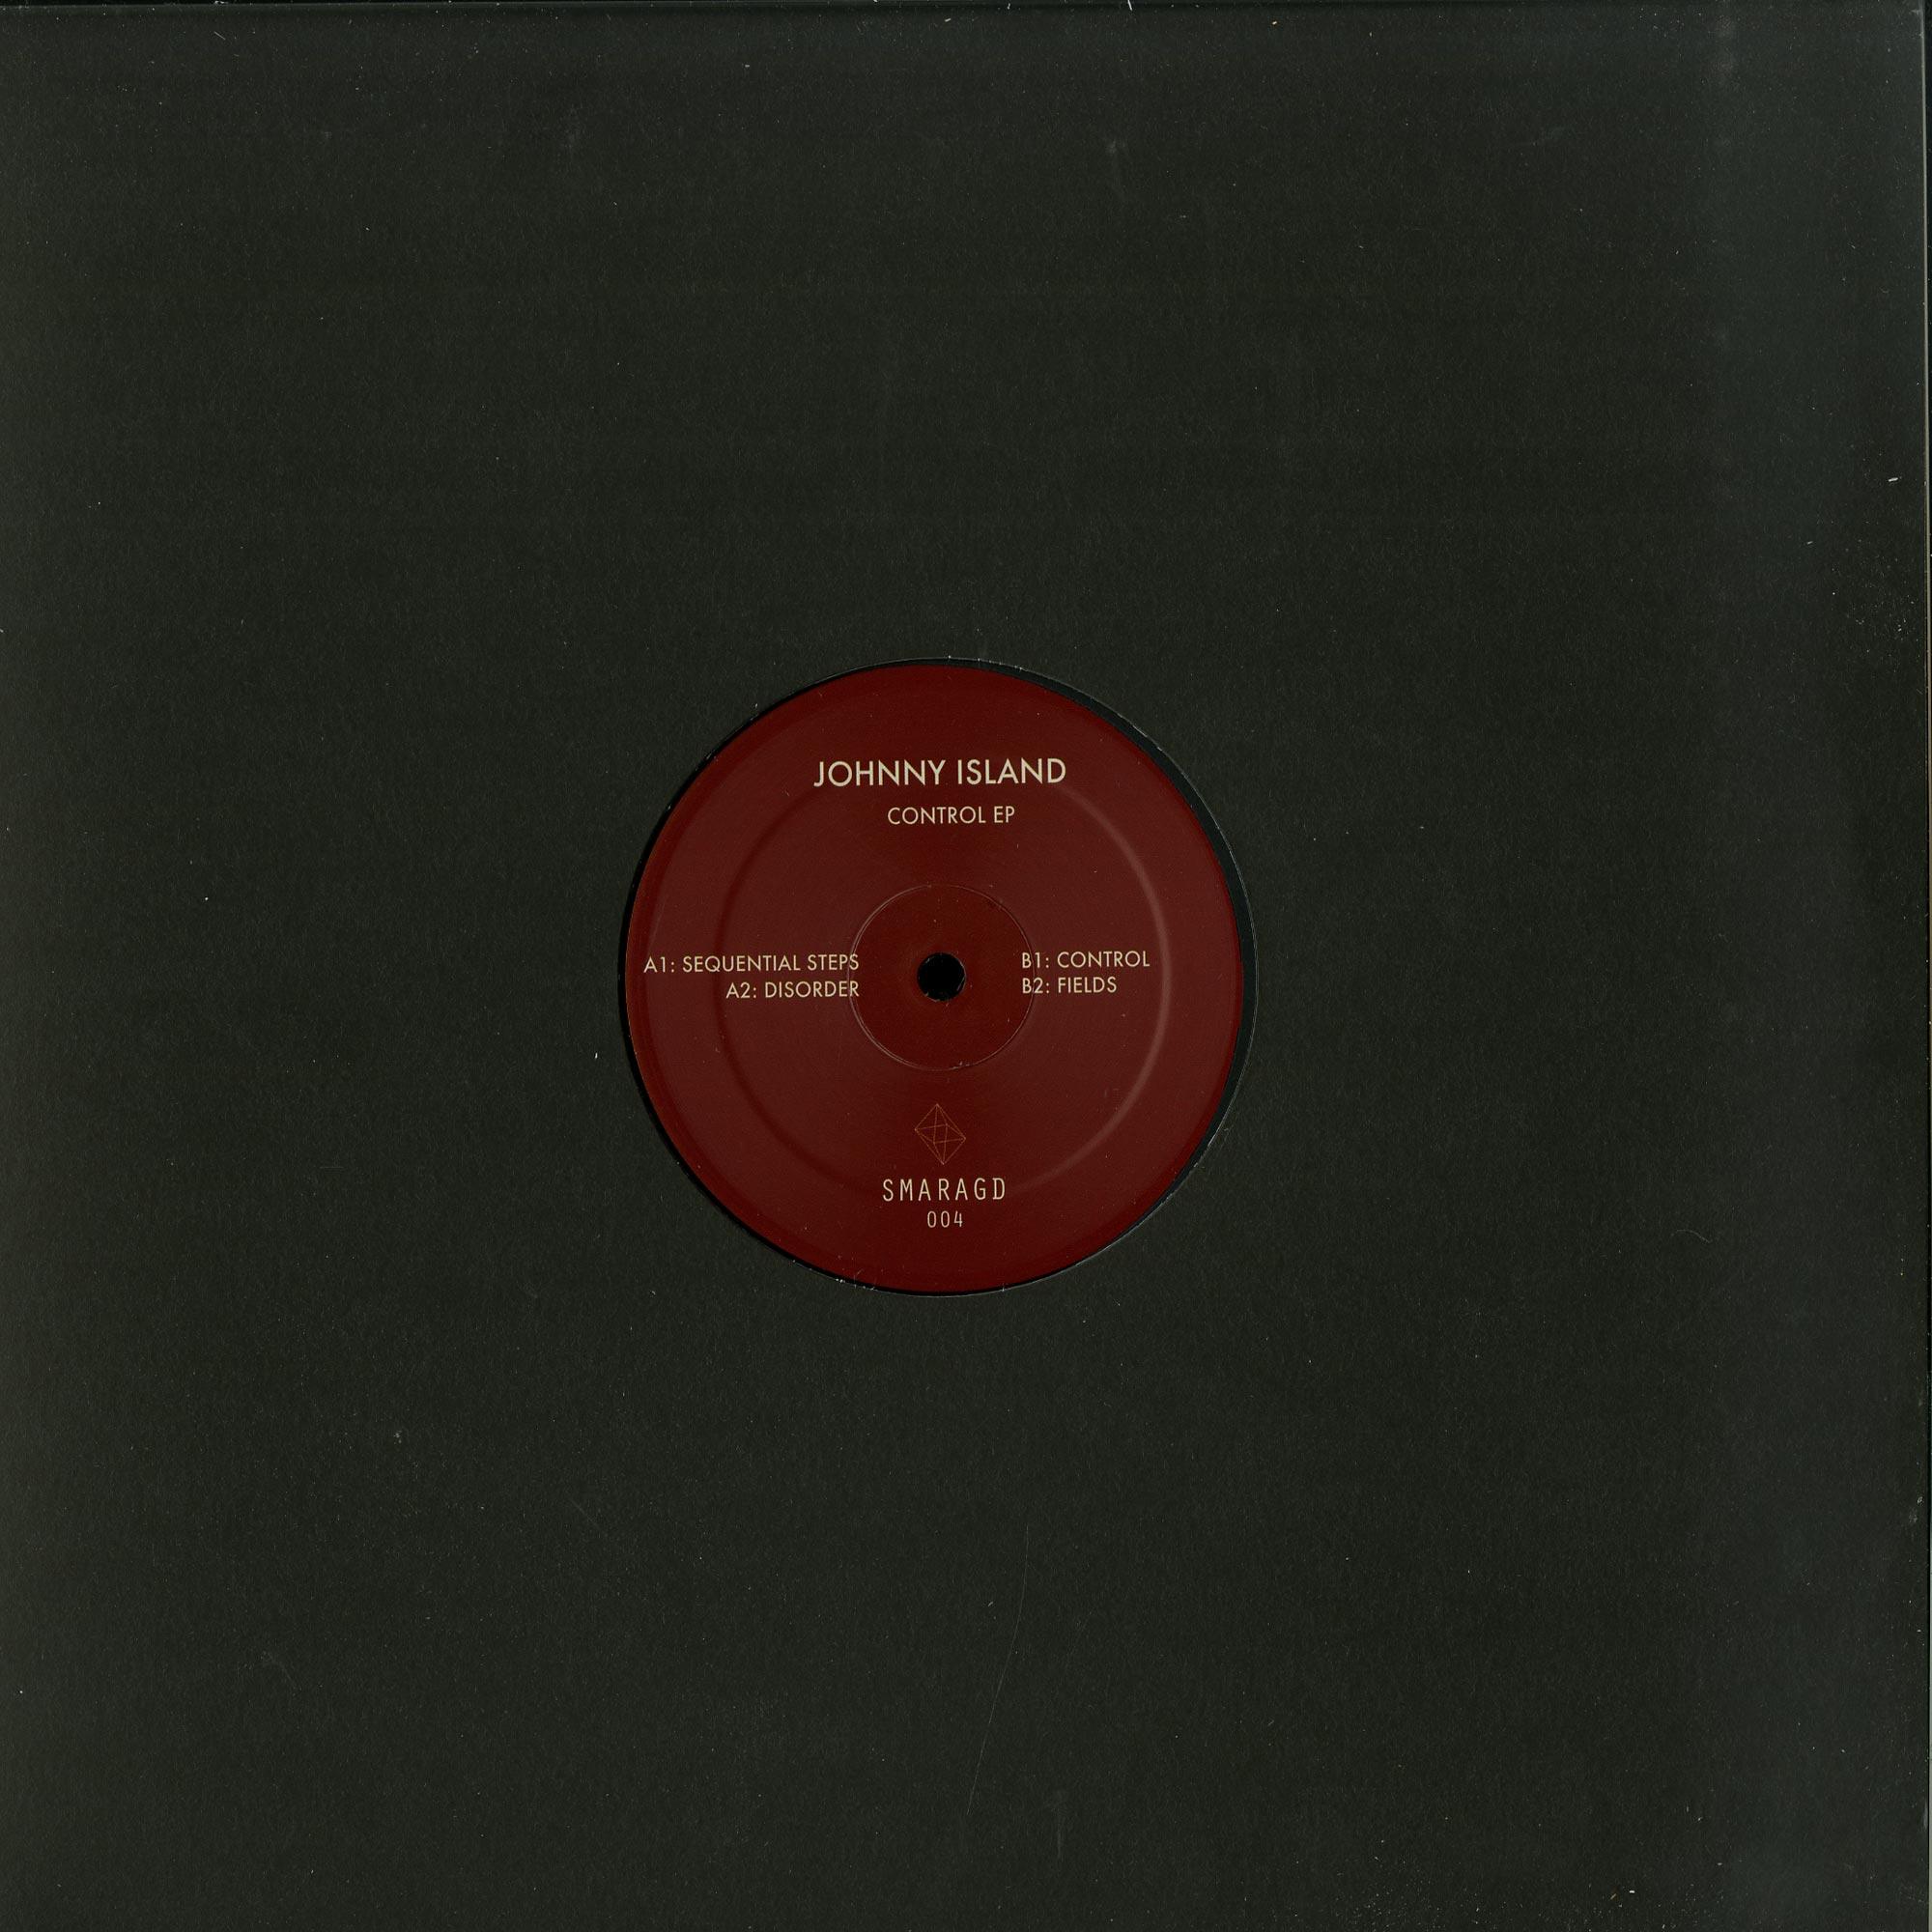 Johnny Island - CONTROL EP